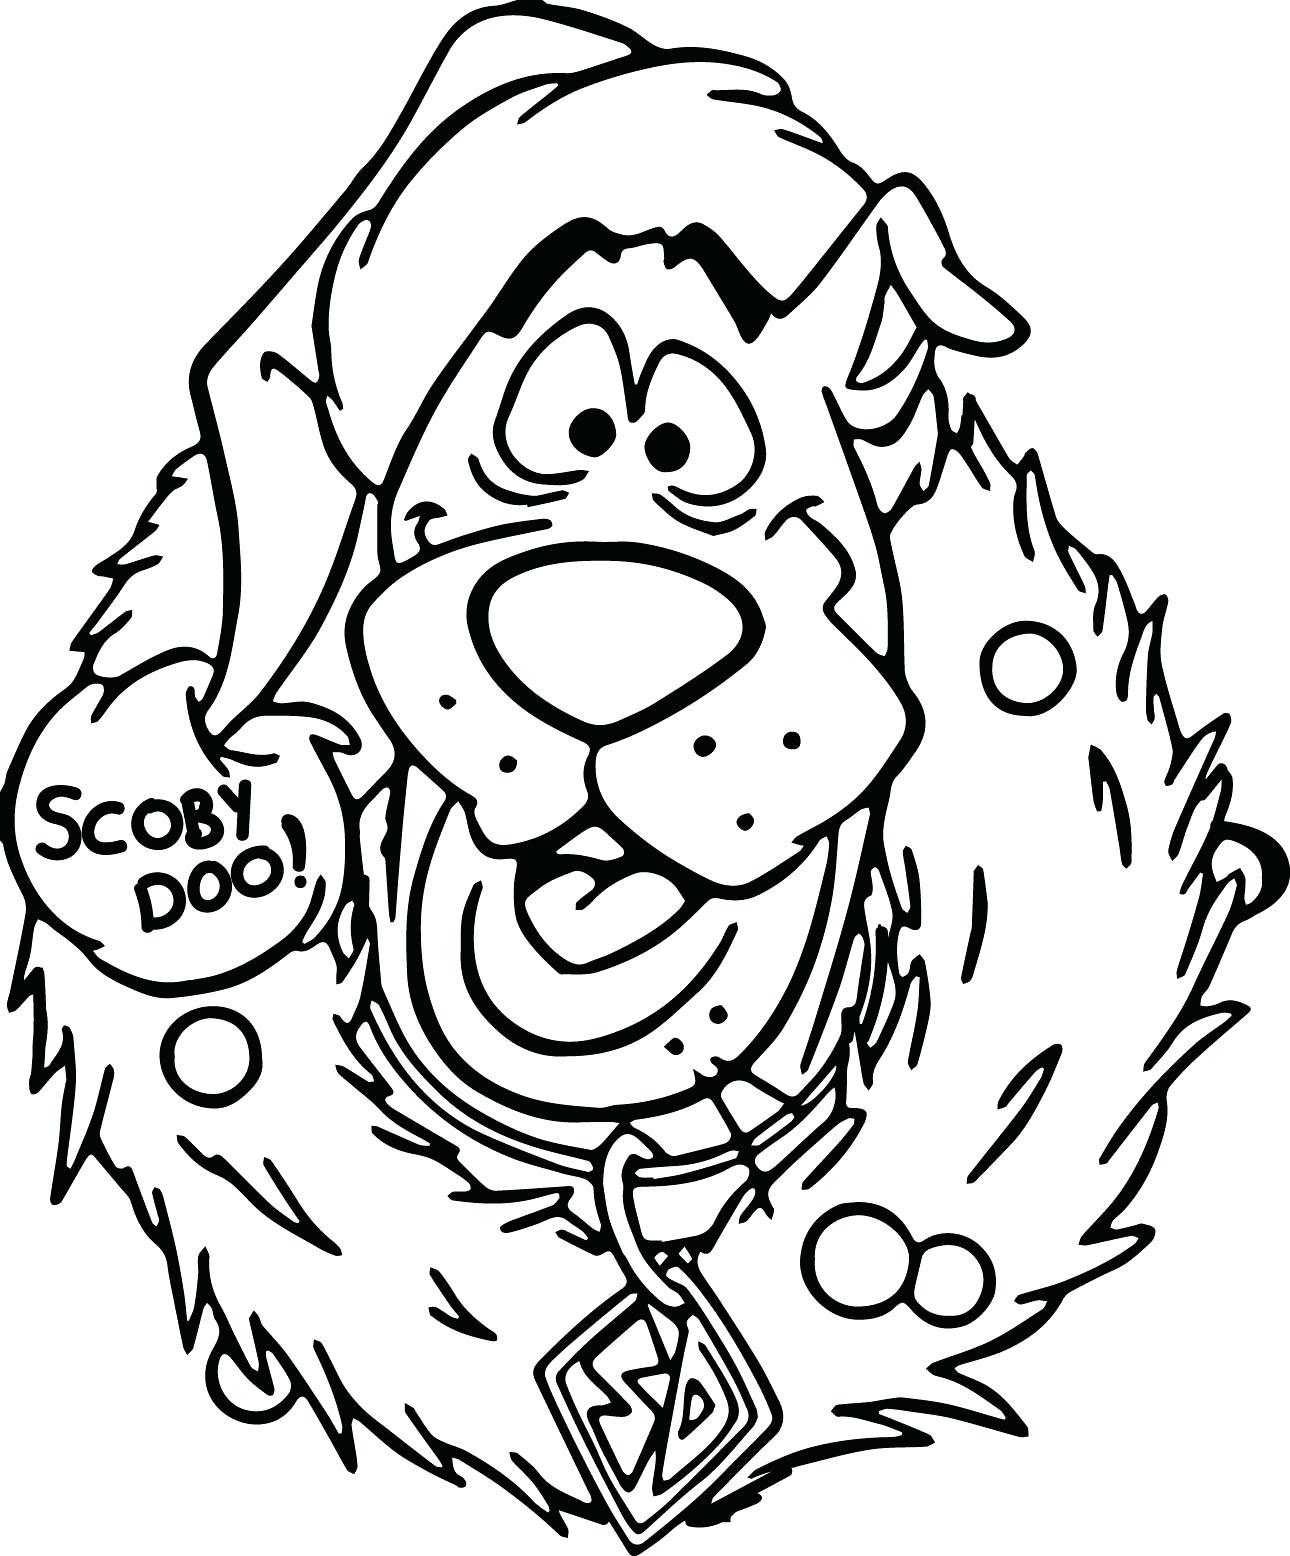 Scooby Doo Outline